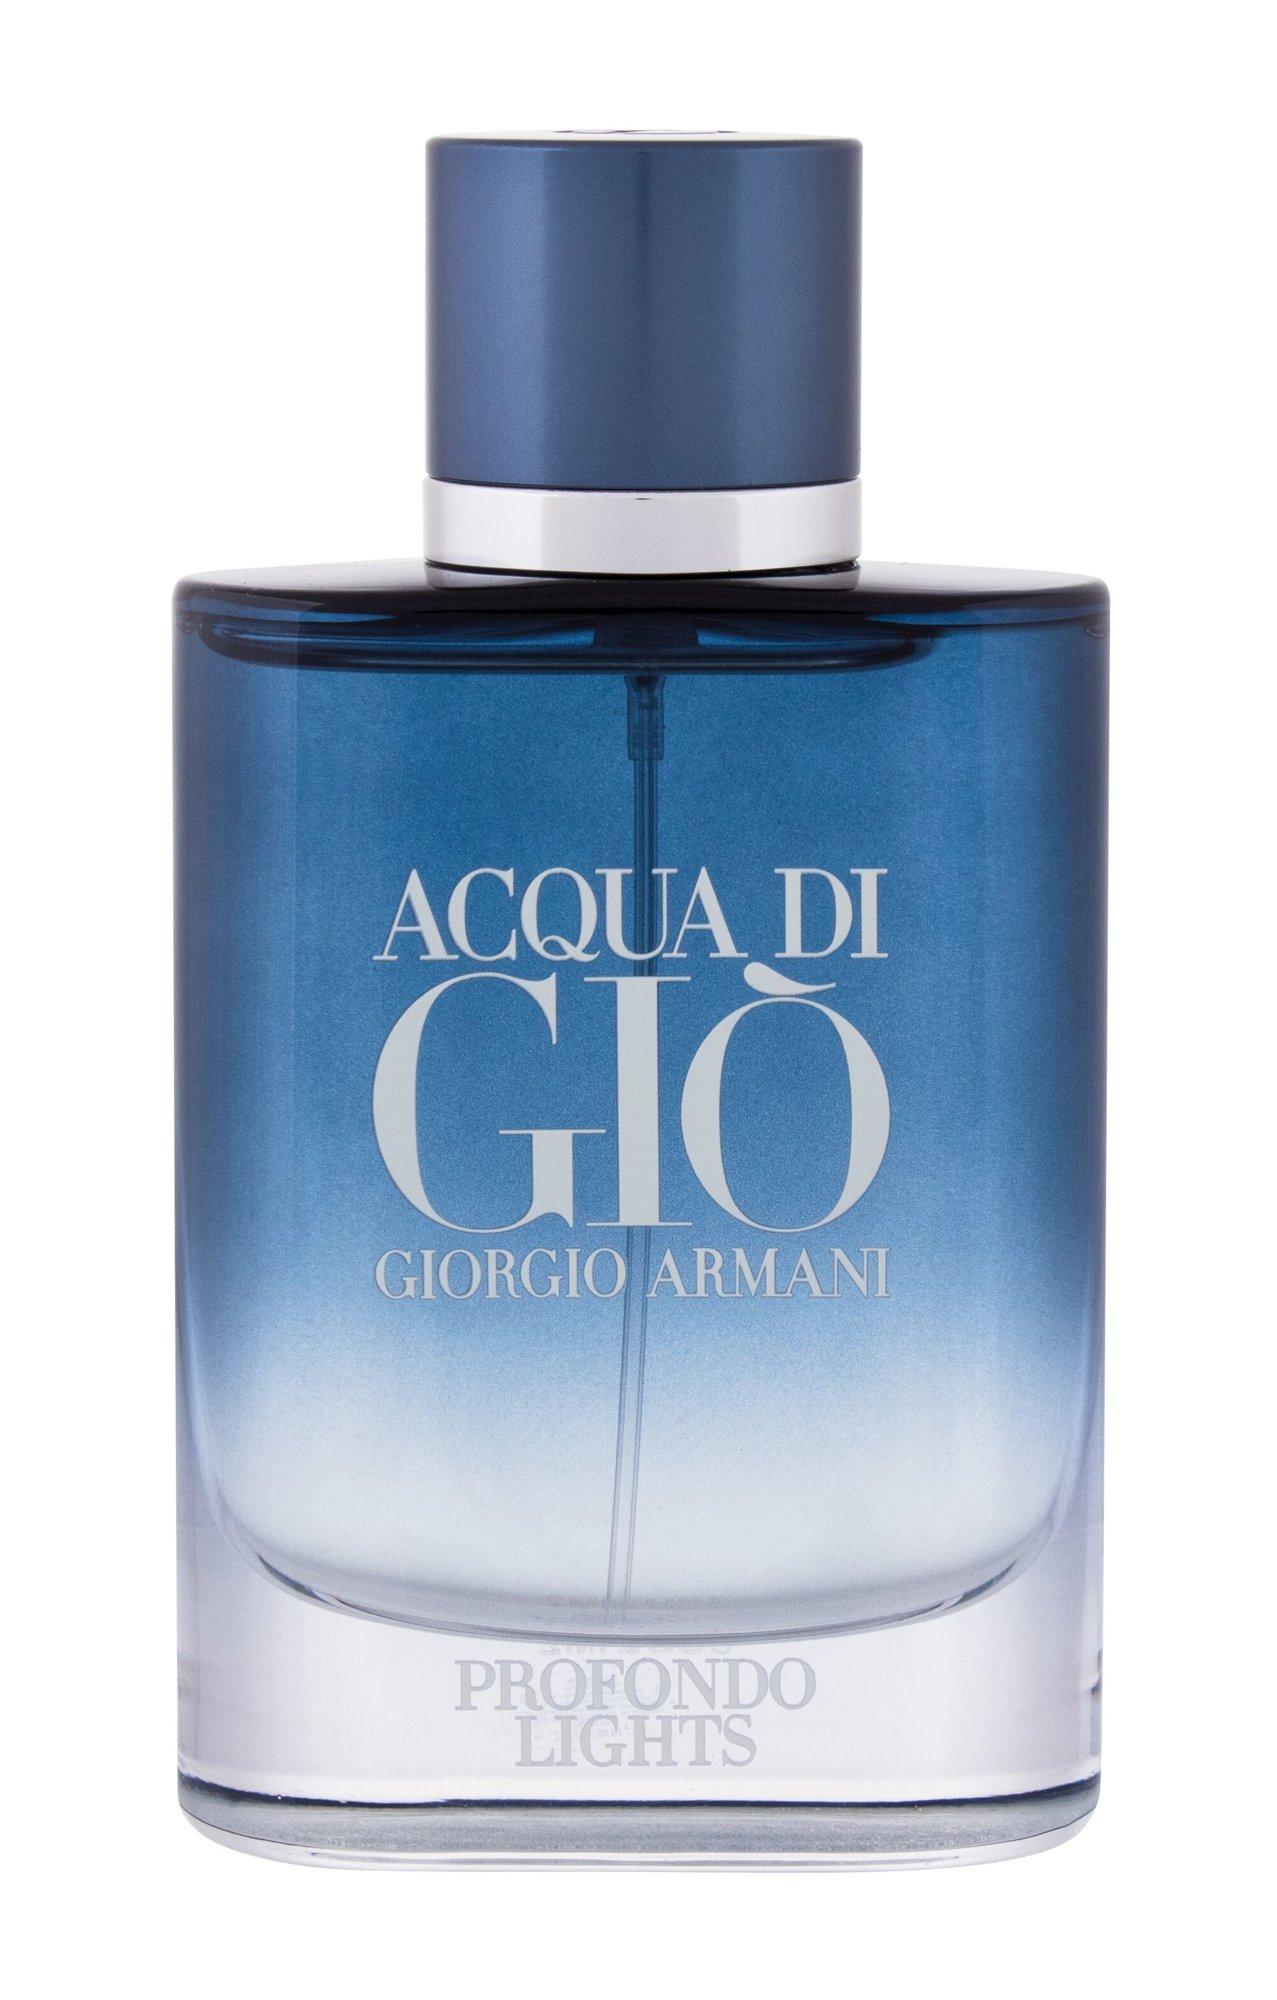 Giorgio Armani Acqua di Gio Profondo Lights, Parfumovaná voda 75ml